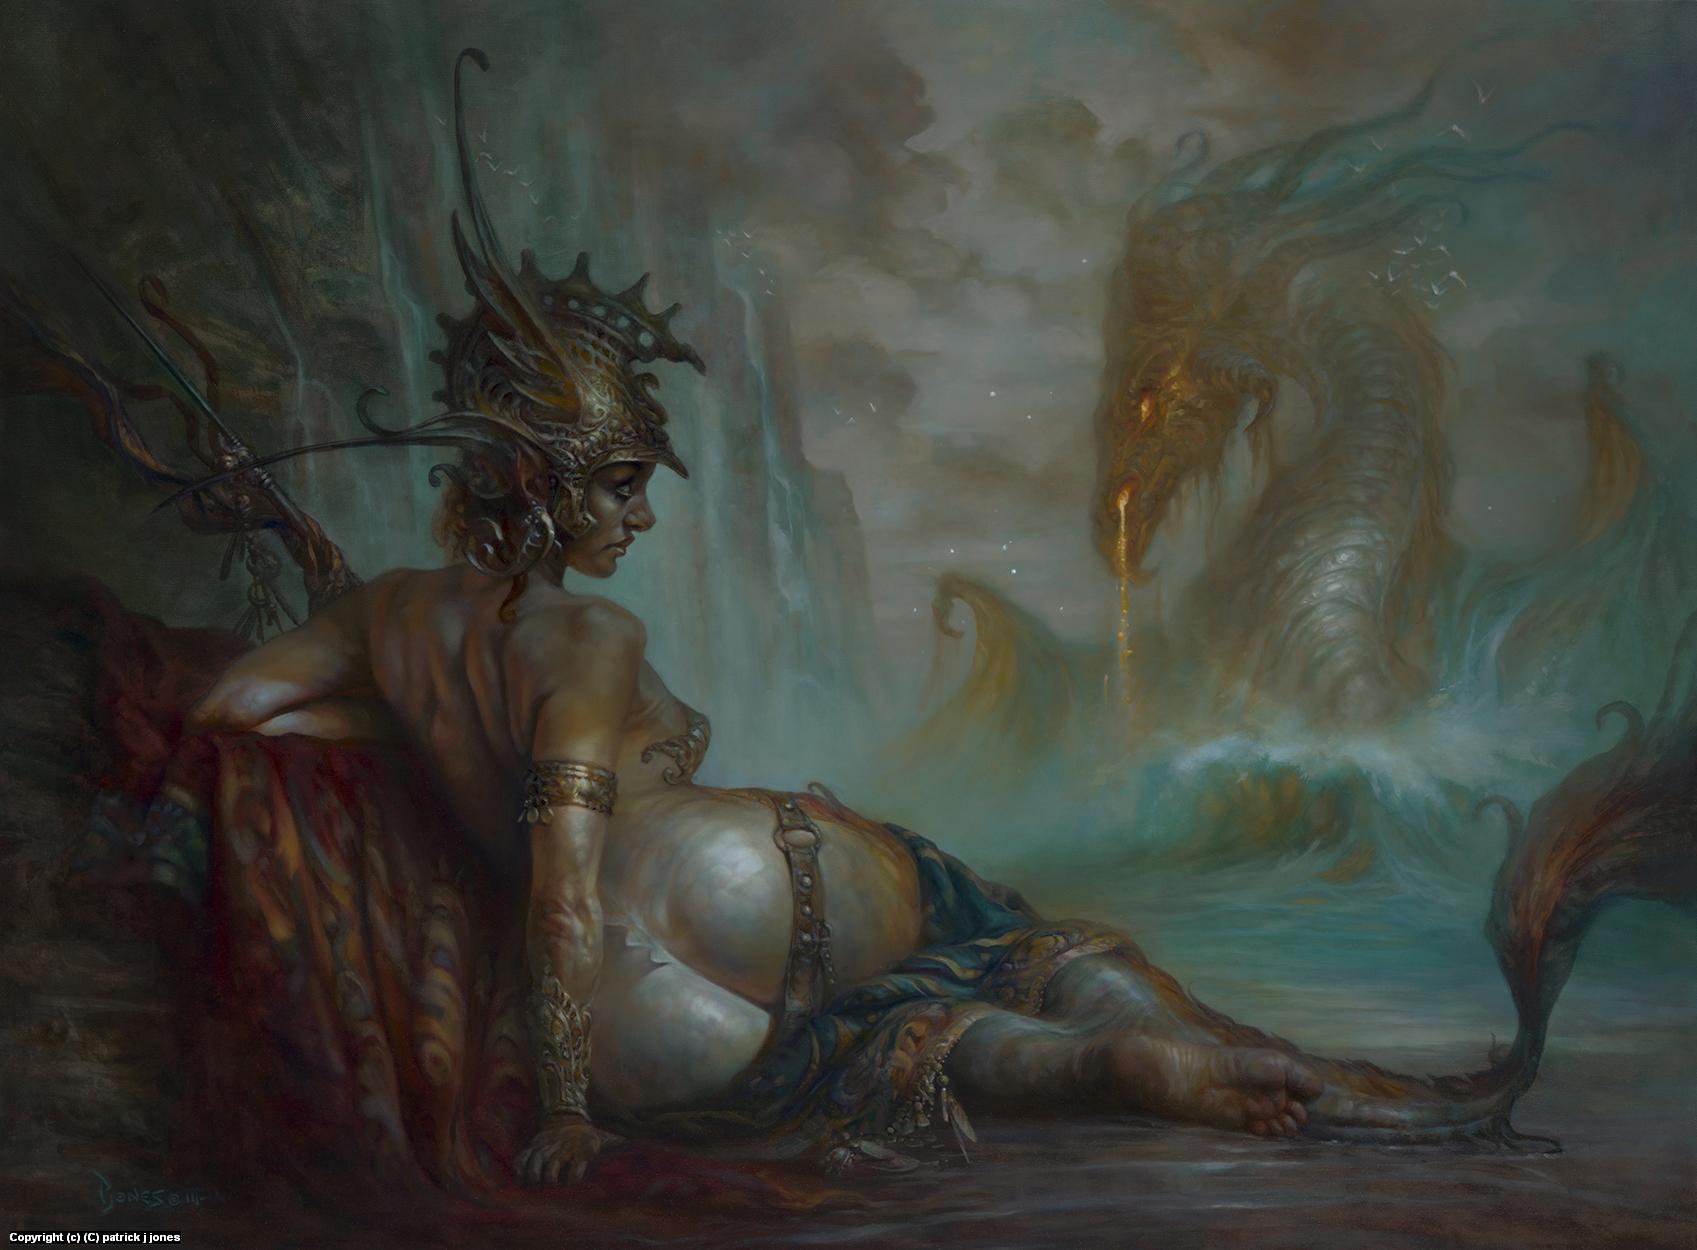 The Awakening Artwork by patrick jones